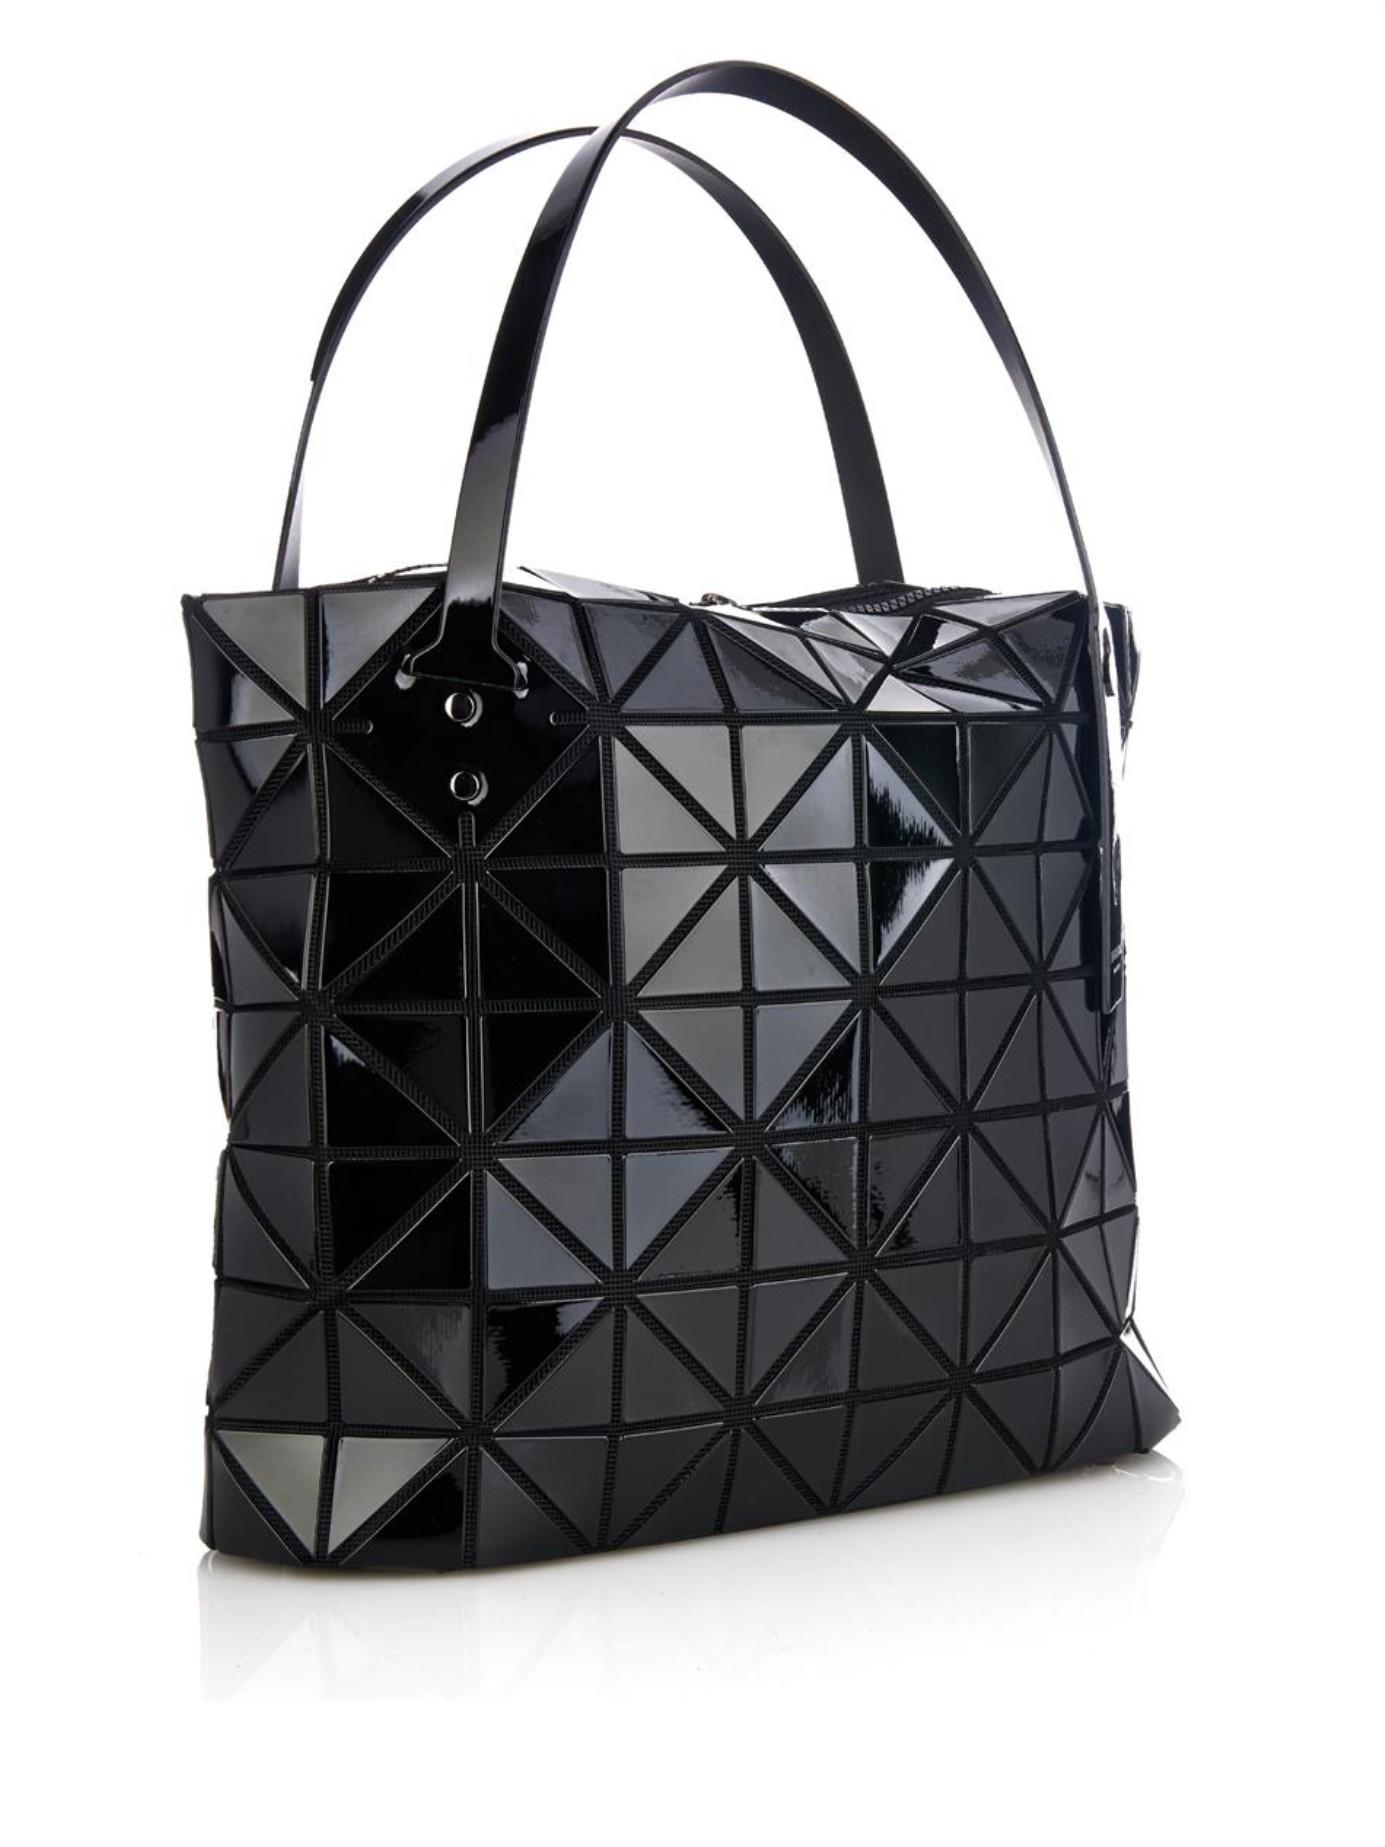 3be7eee5d7 Lyst - Bao Bao Issey Miyake Rock Basic Shopper Tote in Black